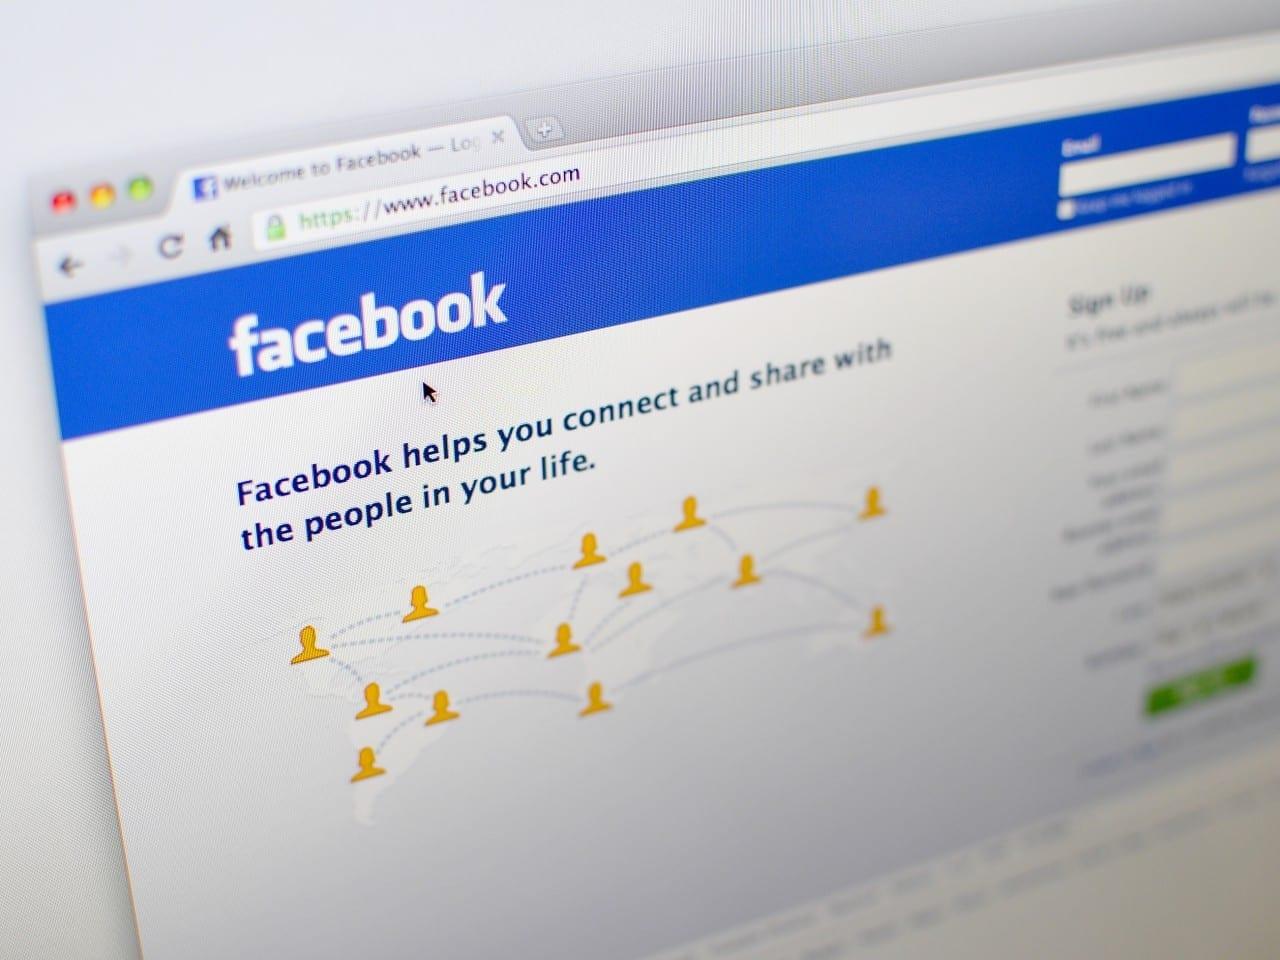 social-media-image-size-guide-facebook-pages.jpg